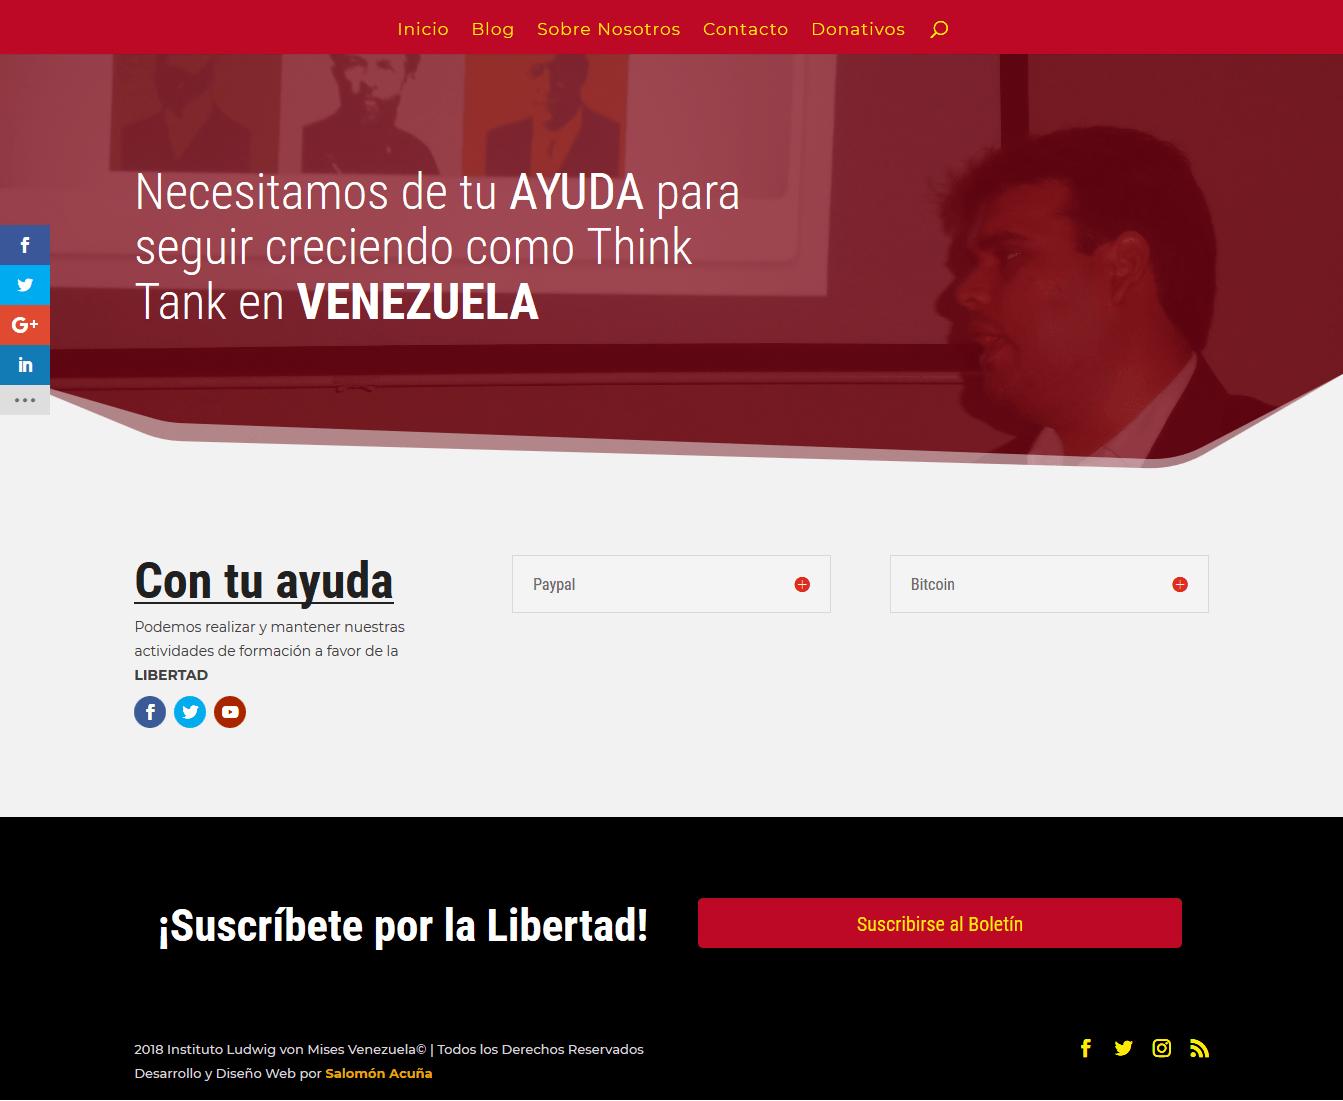 Mises Venezuela Donaciones